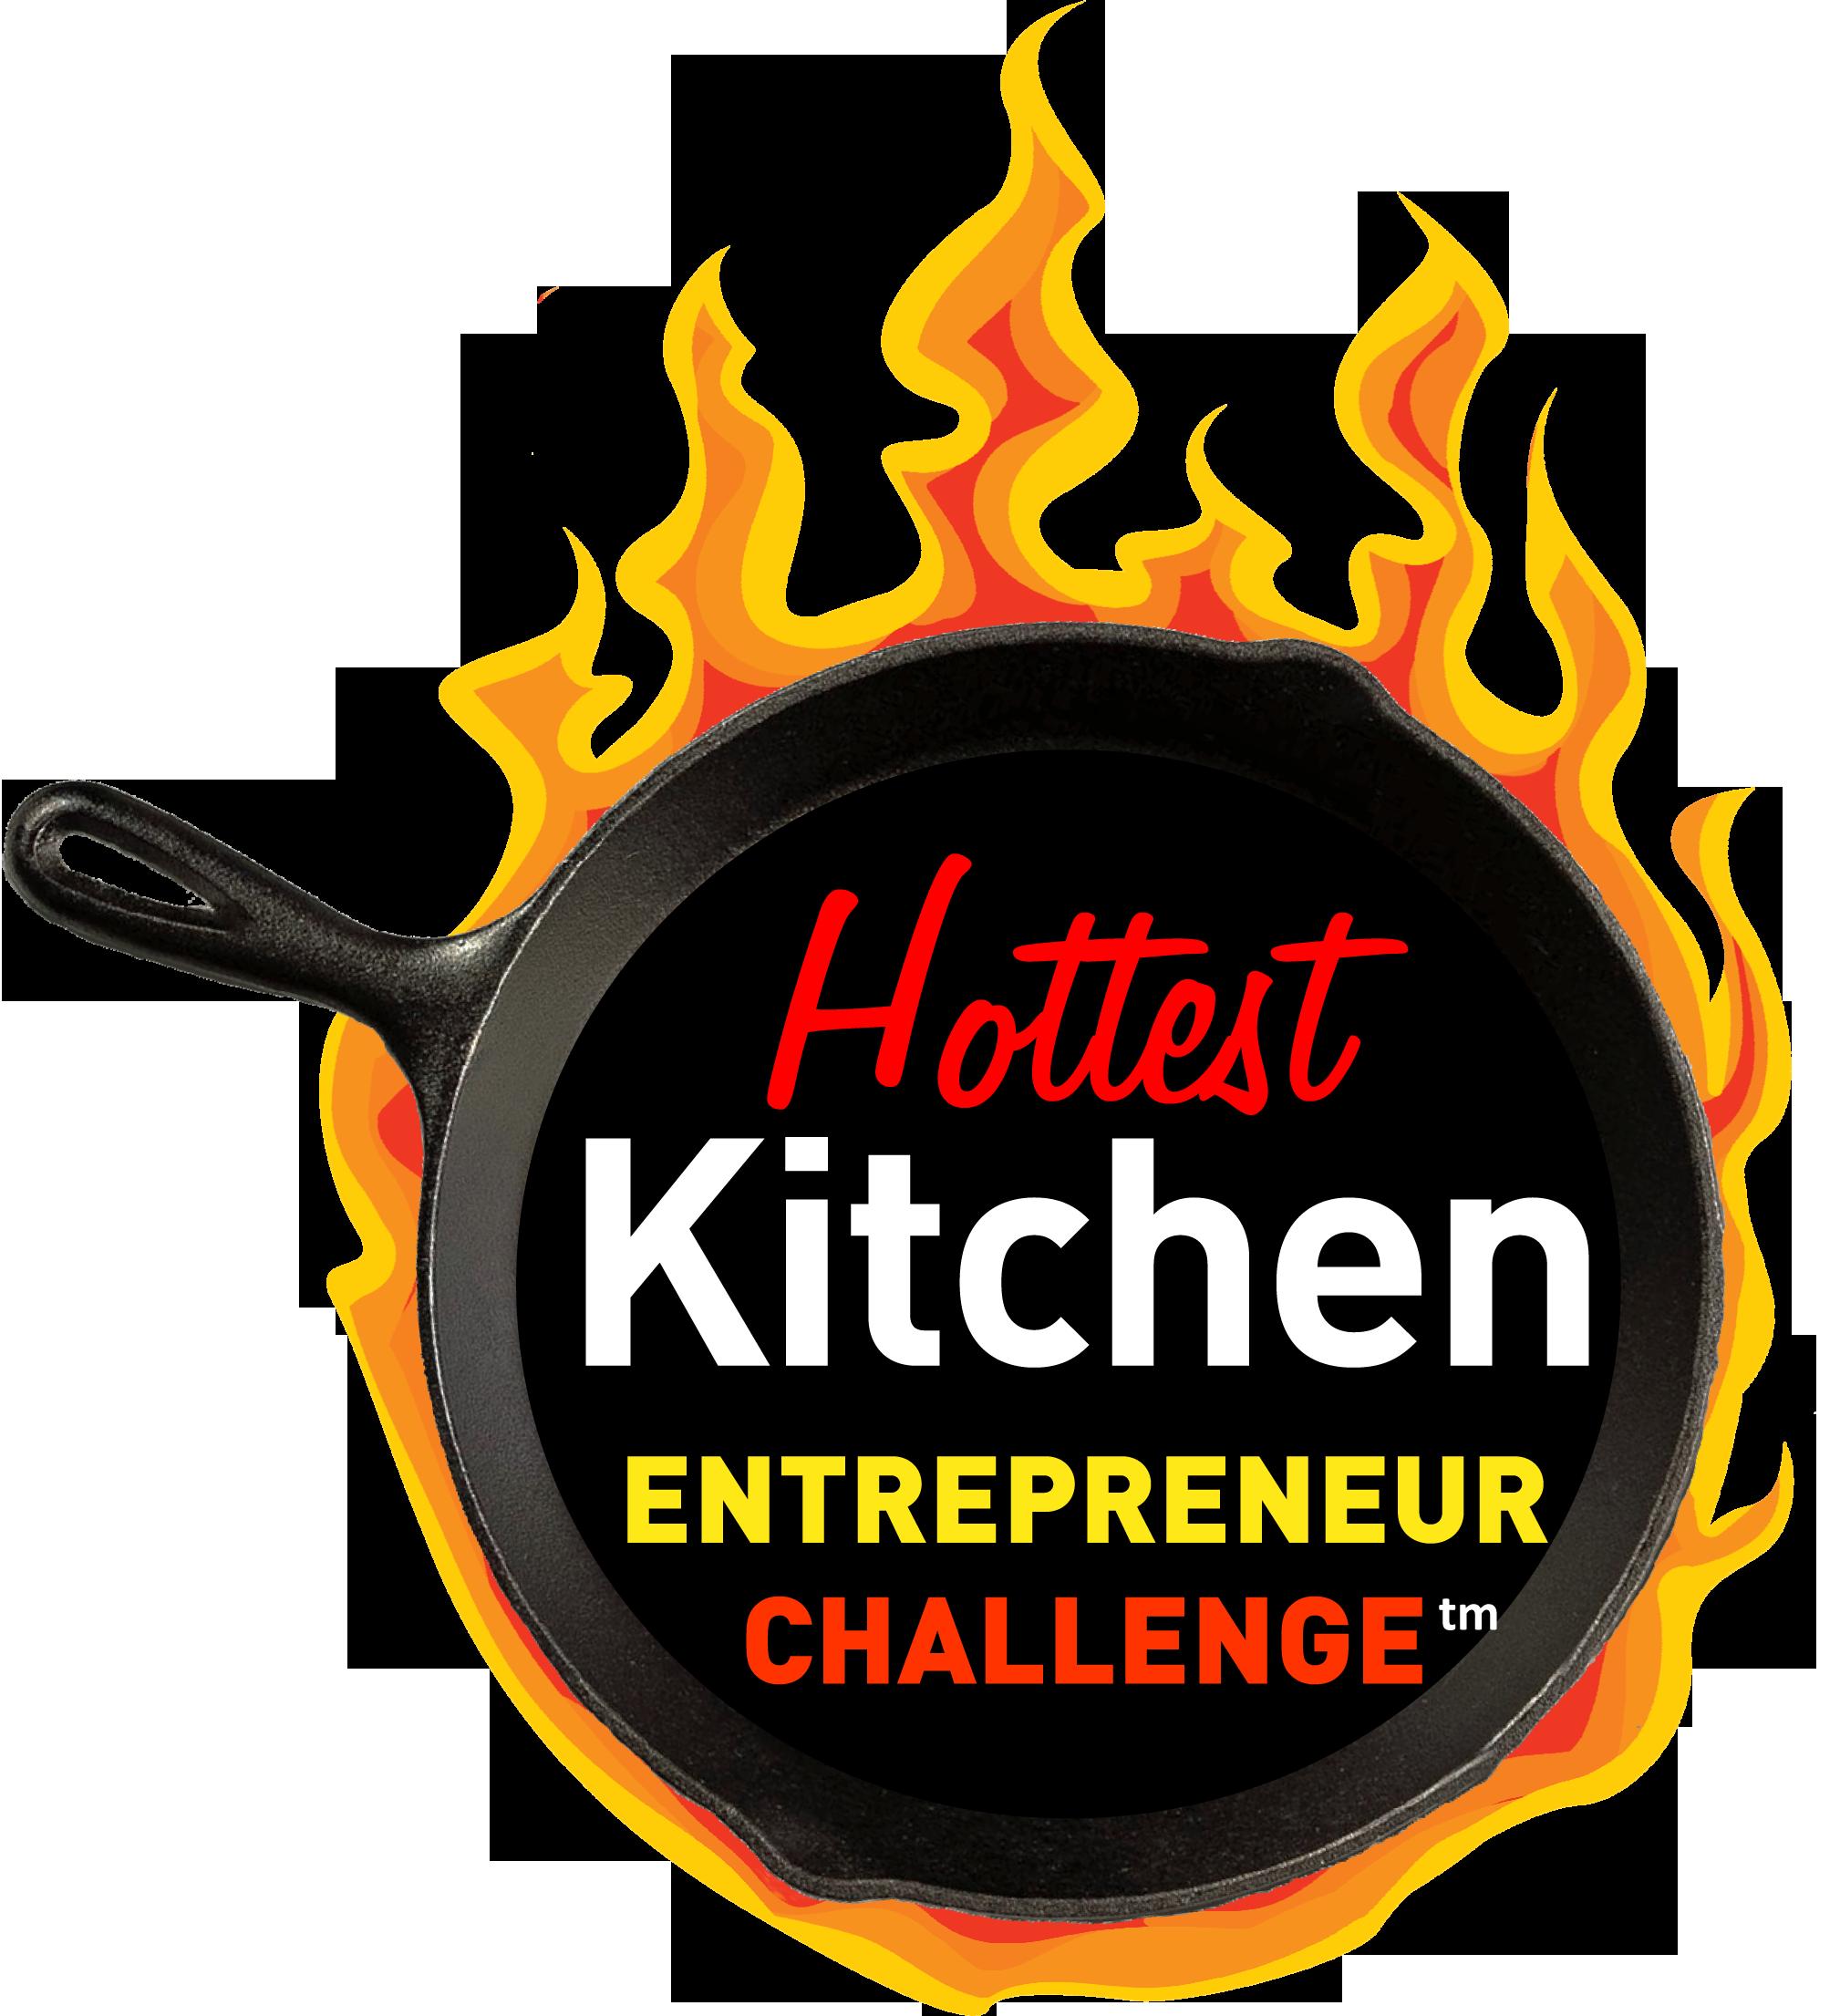 Hottest Kitchen Entrepreneur Challenge Logo